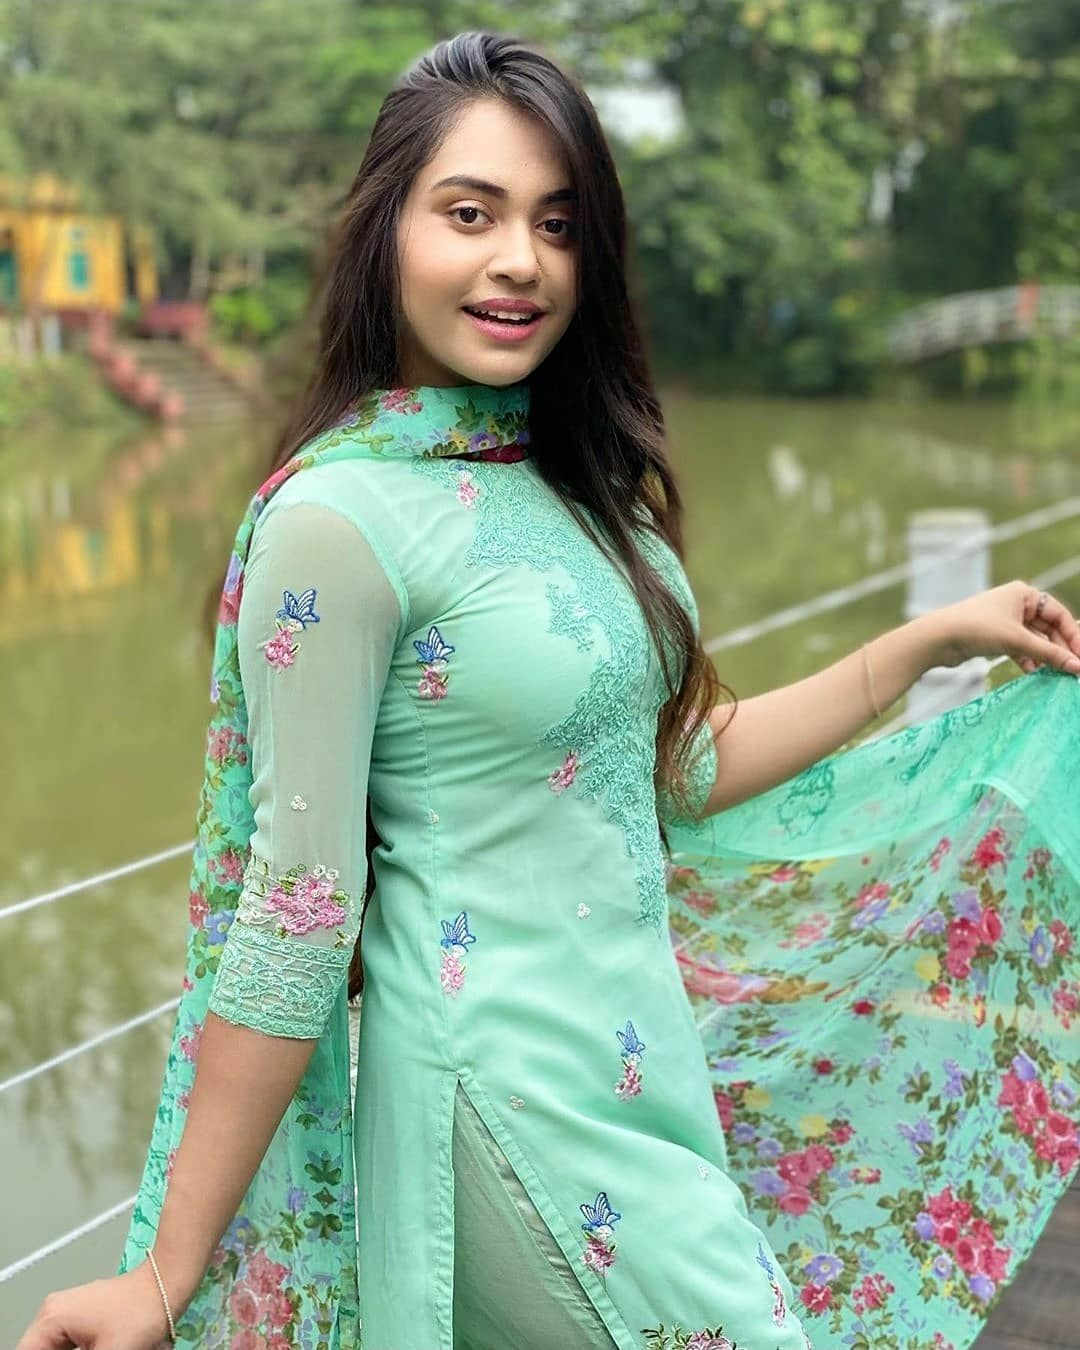 Indian desi college girl in red tight salwar kameez dress